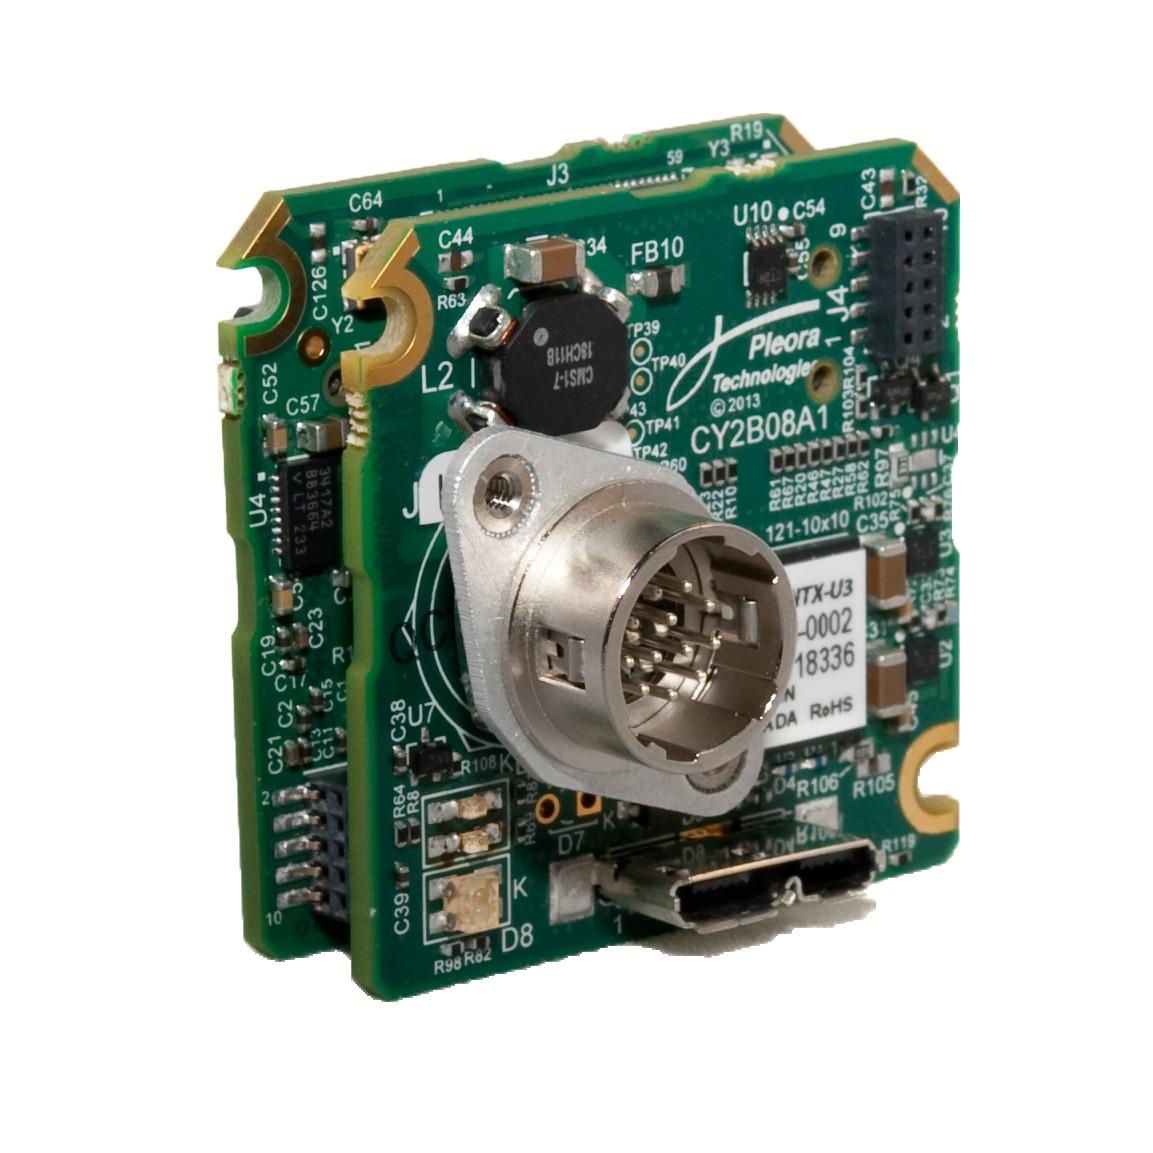 Pleora Embedded Video Interface iPORT NTx-U3